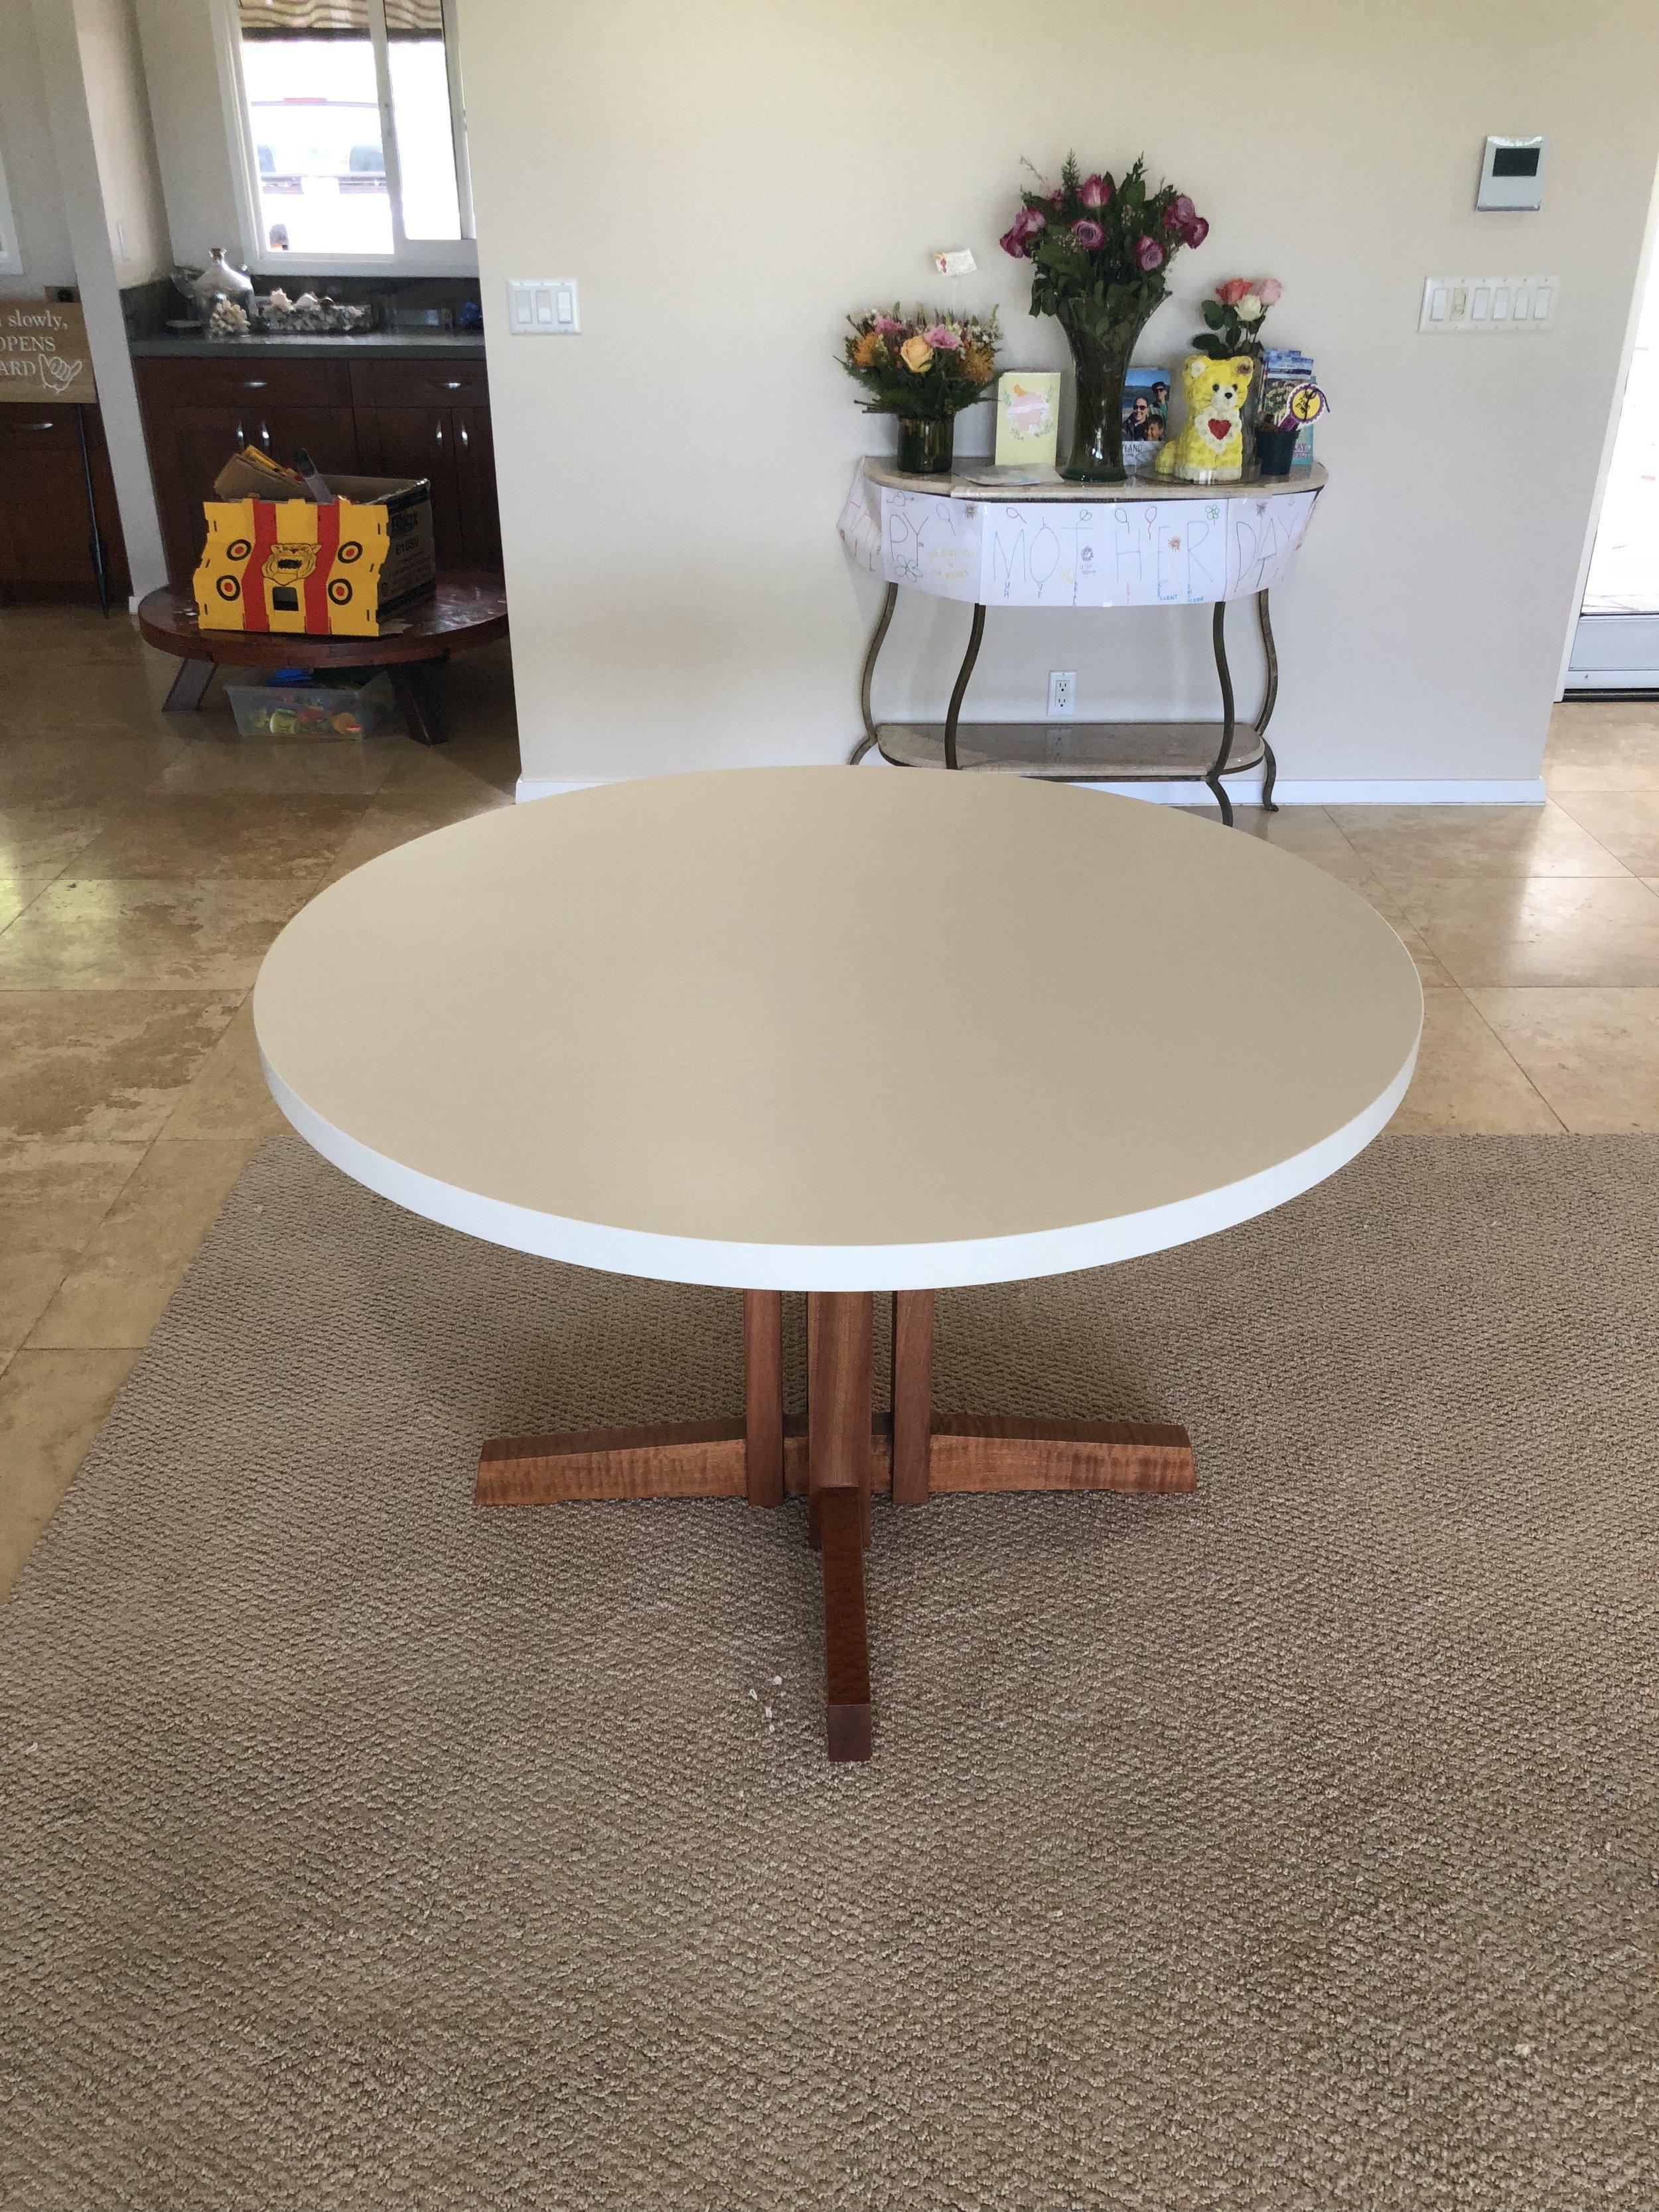 Whitewashed oak kitchen table top.